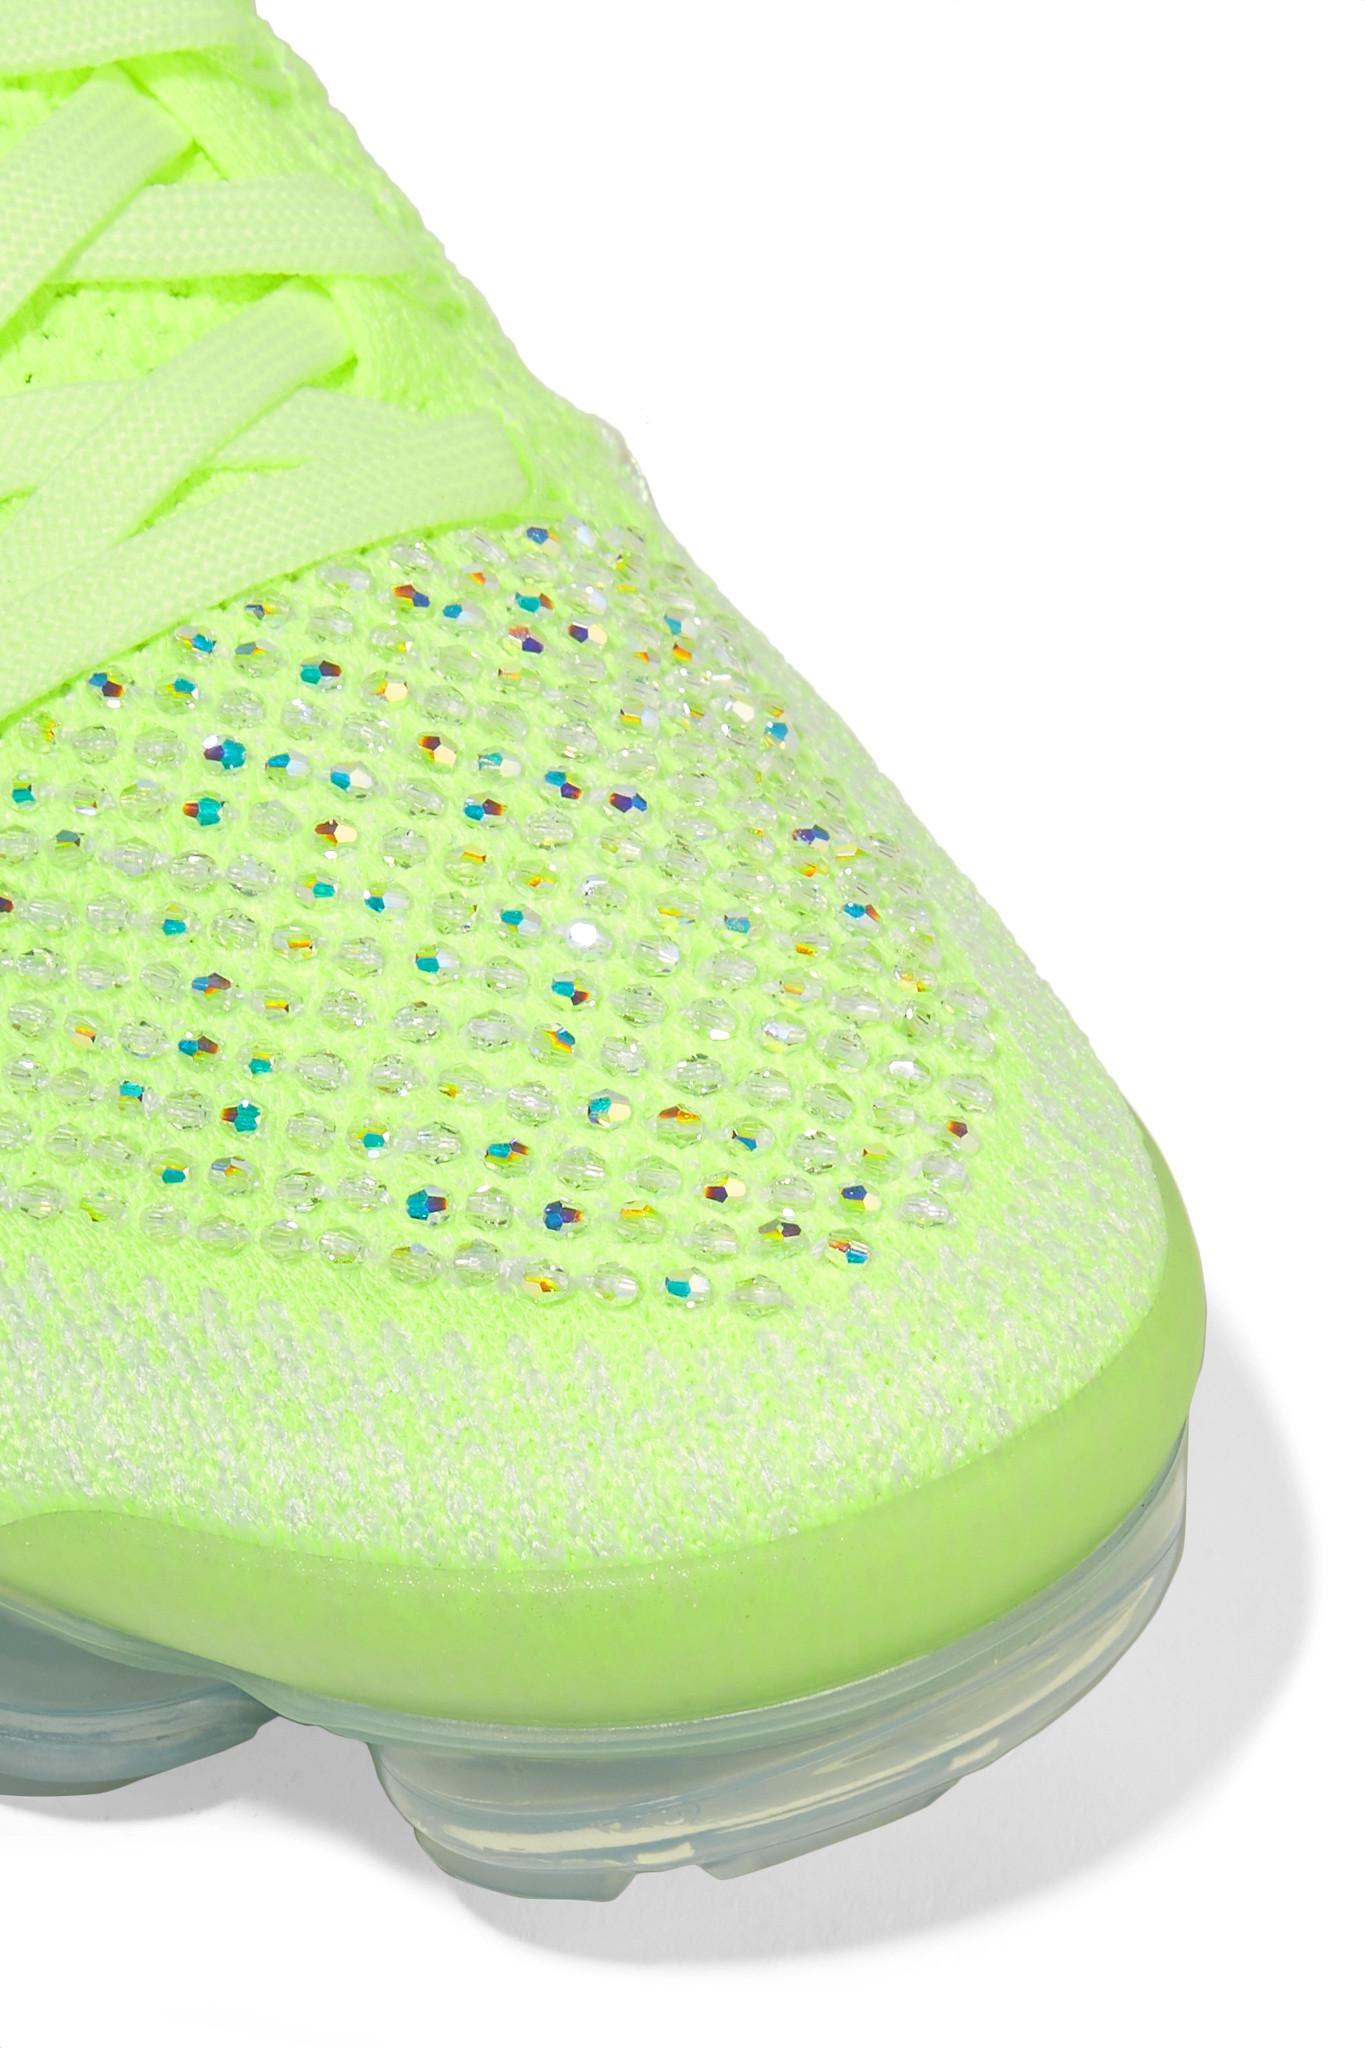 cbd4d2db1a9a Nike - Green Air Vapormax 2 Swarovski Crystal-embellished Flyknit Sneakers  - Lyst. View fullscreen